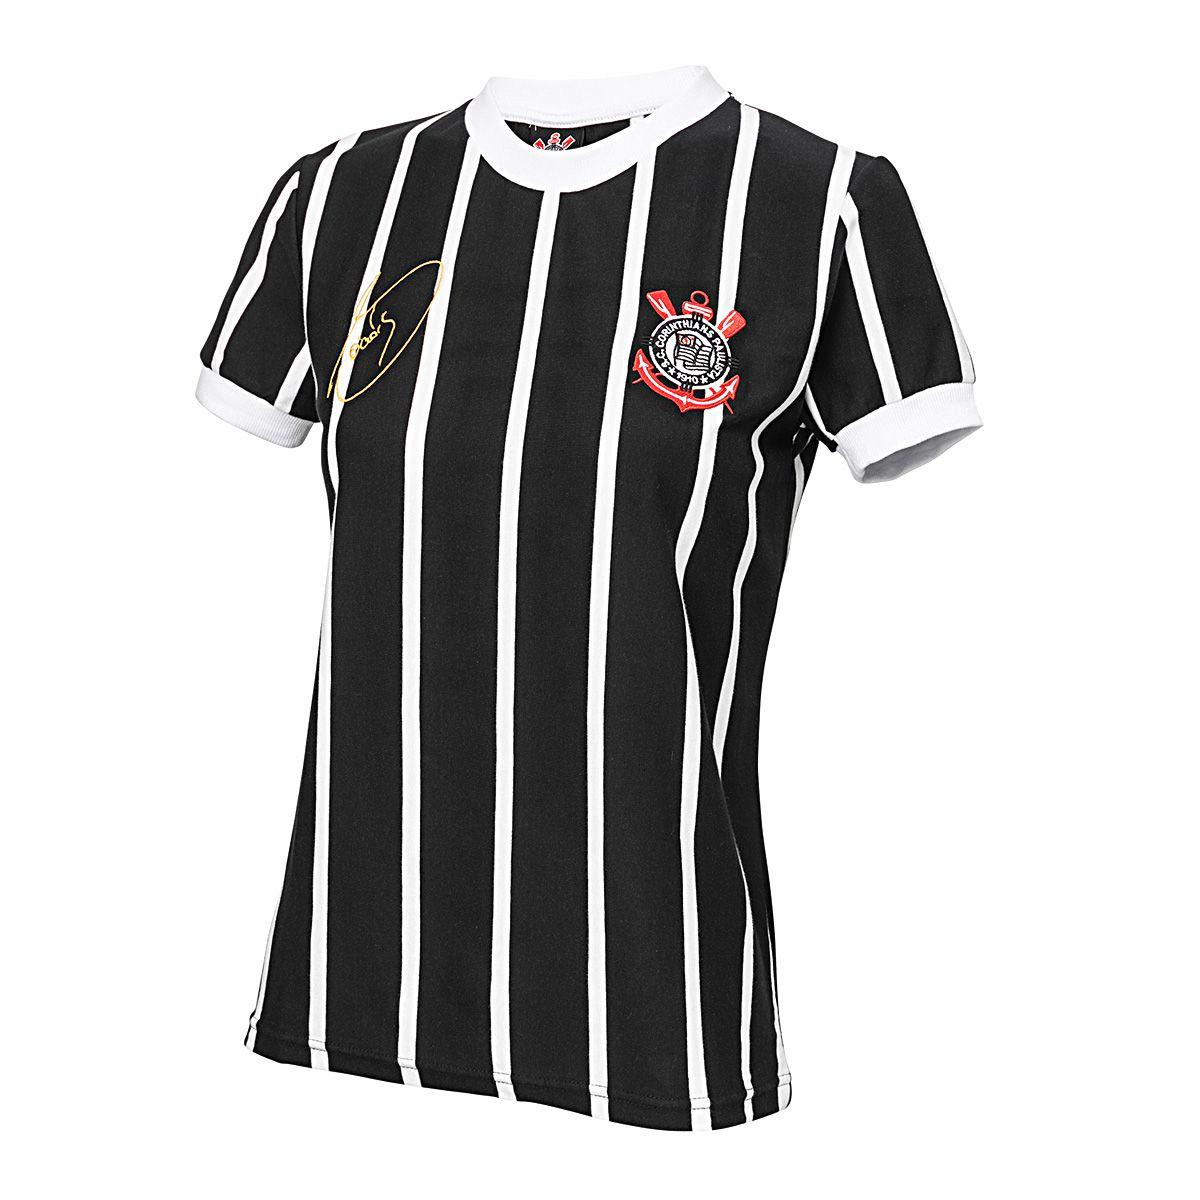 Camisa Retrô Corinthians Democracia 1982 Feminina